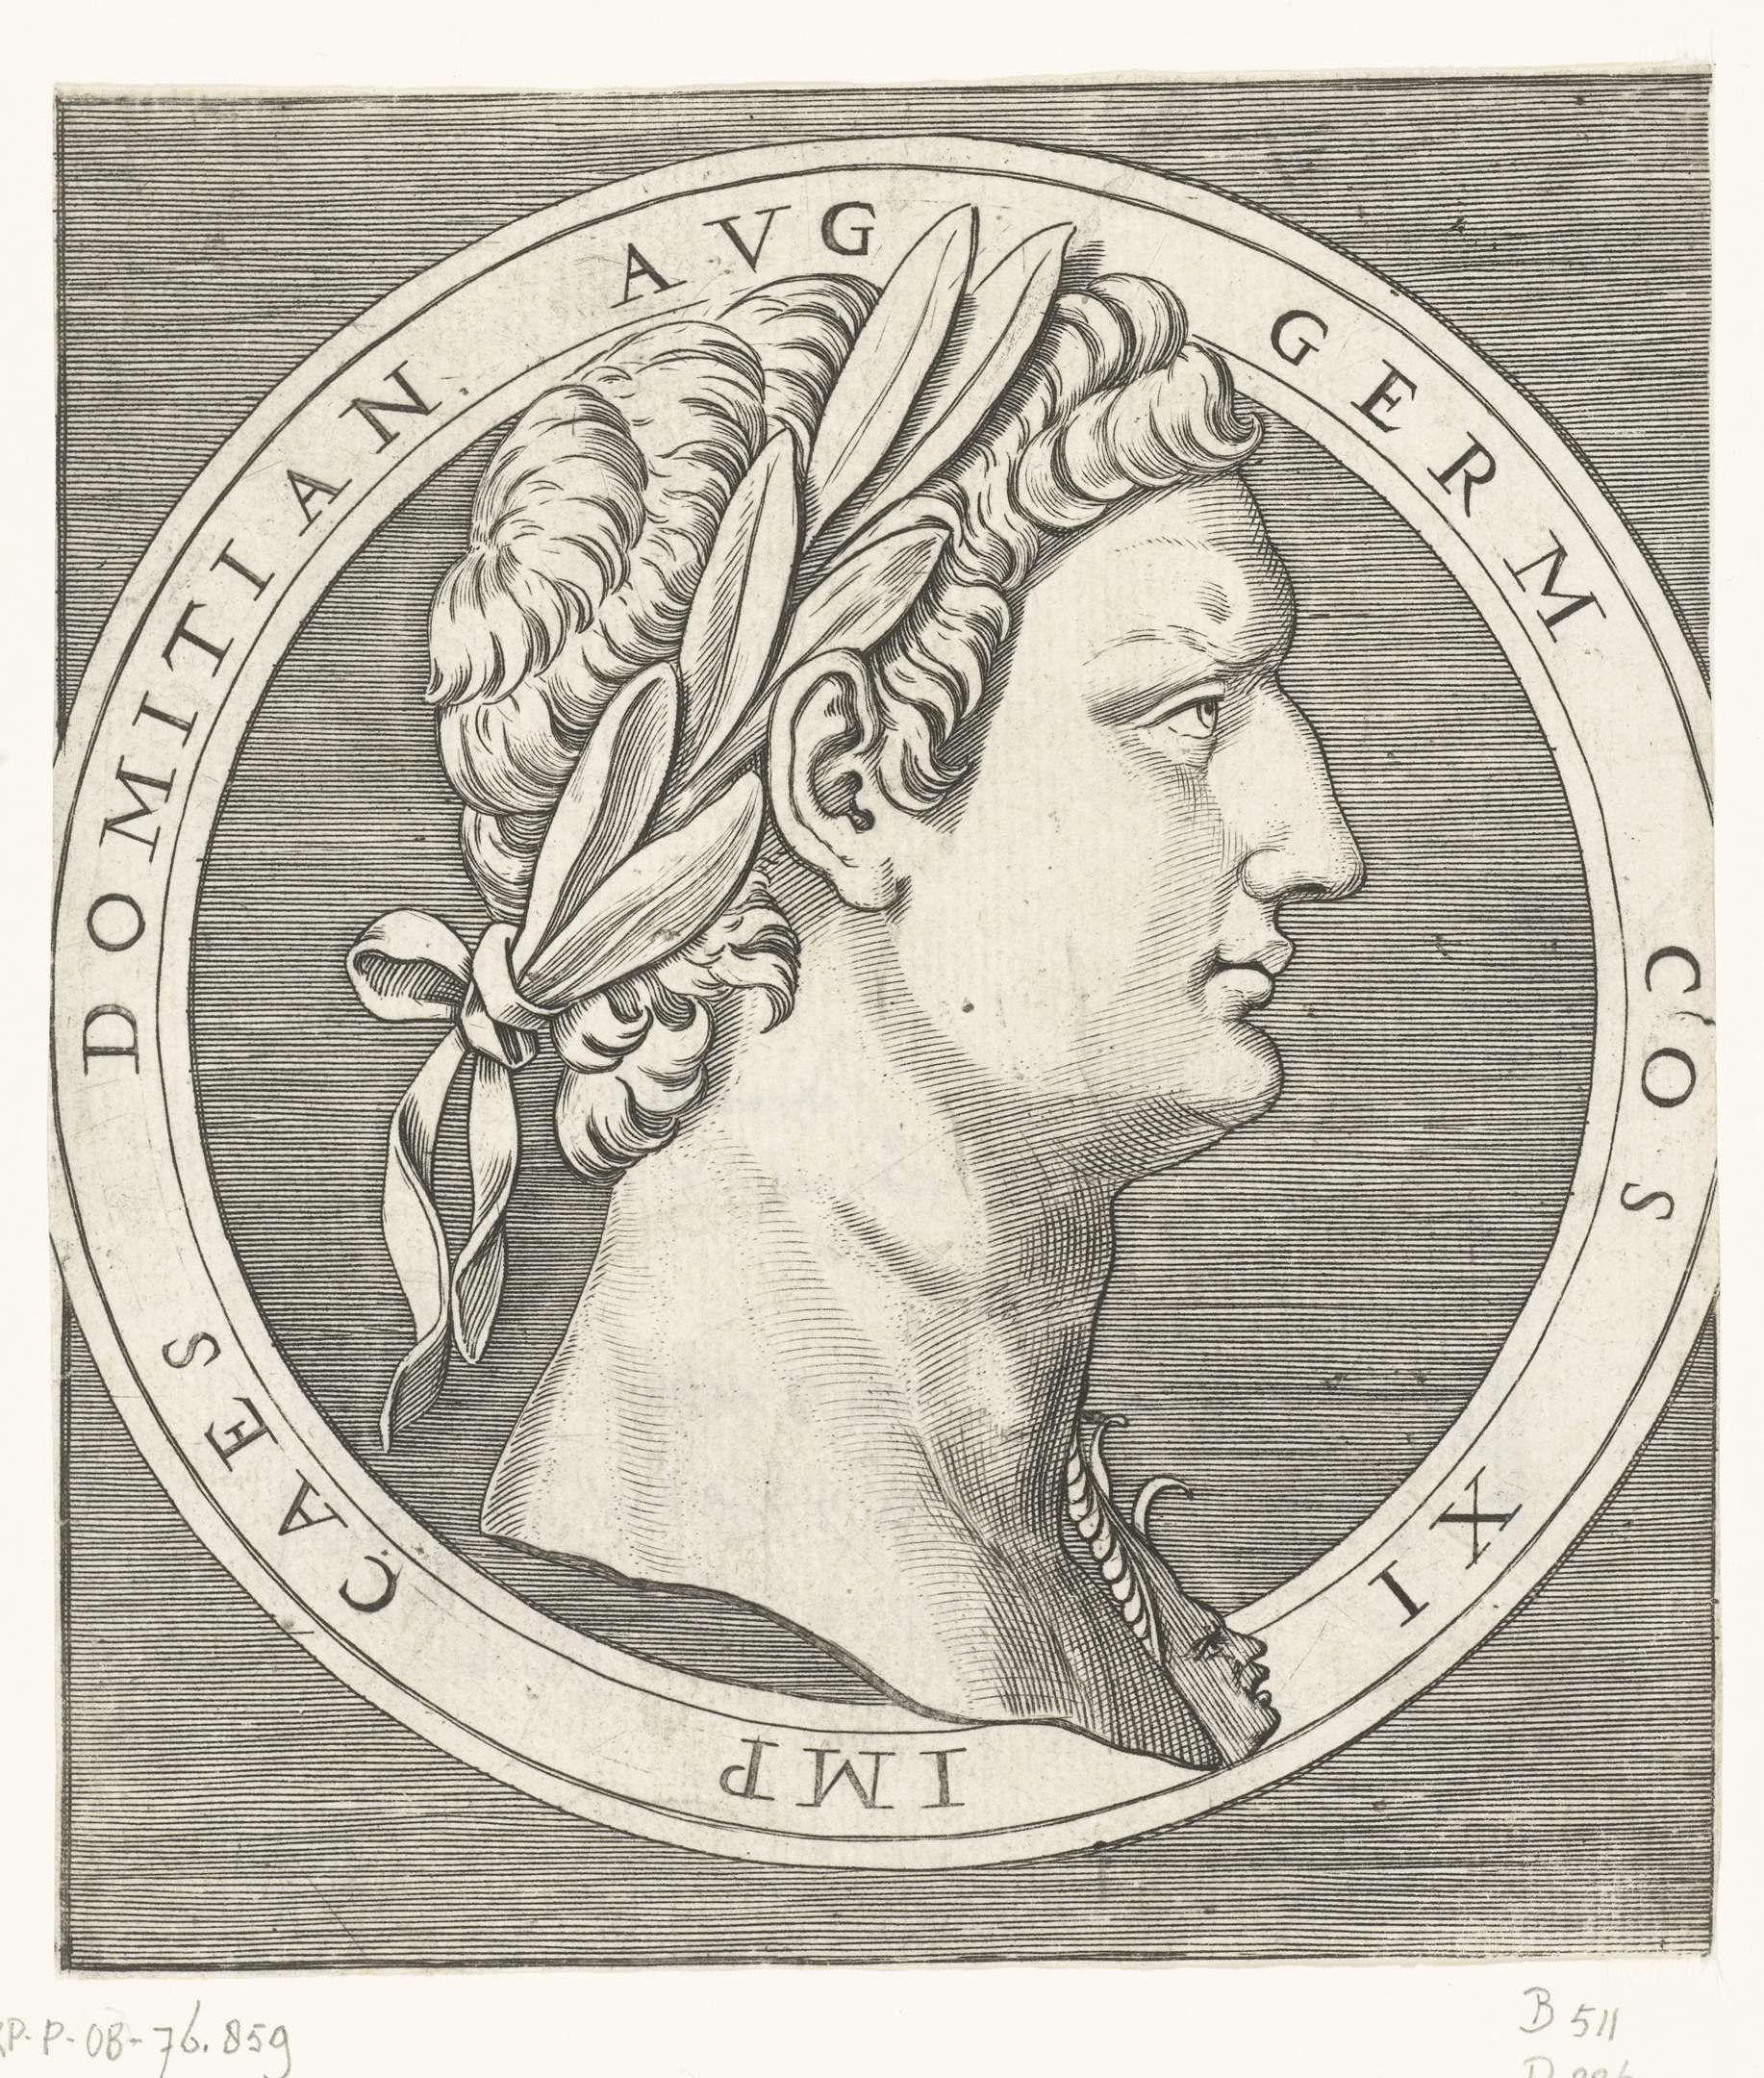 Marcantonio Raimondi | Portret van keizer Domitianus in ronde omlijsting, Marcantonio Raimondi, 1510 - 1527 |